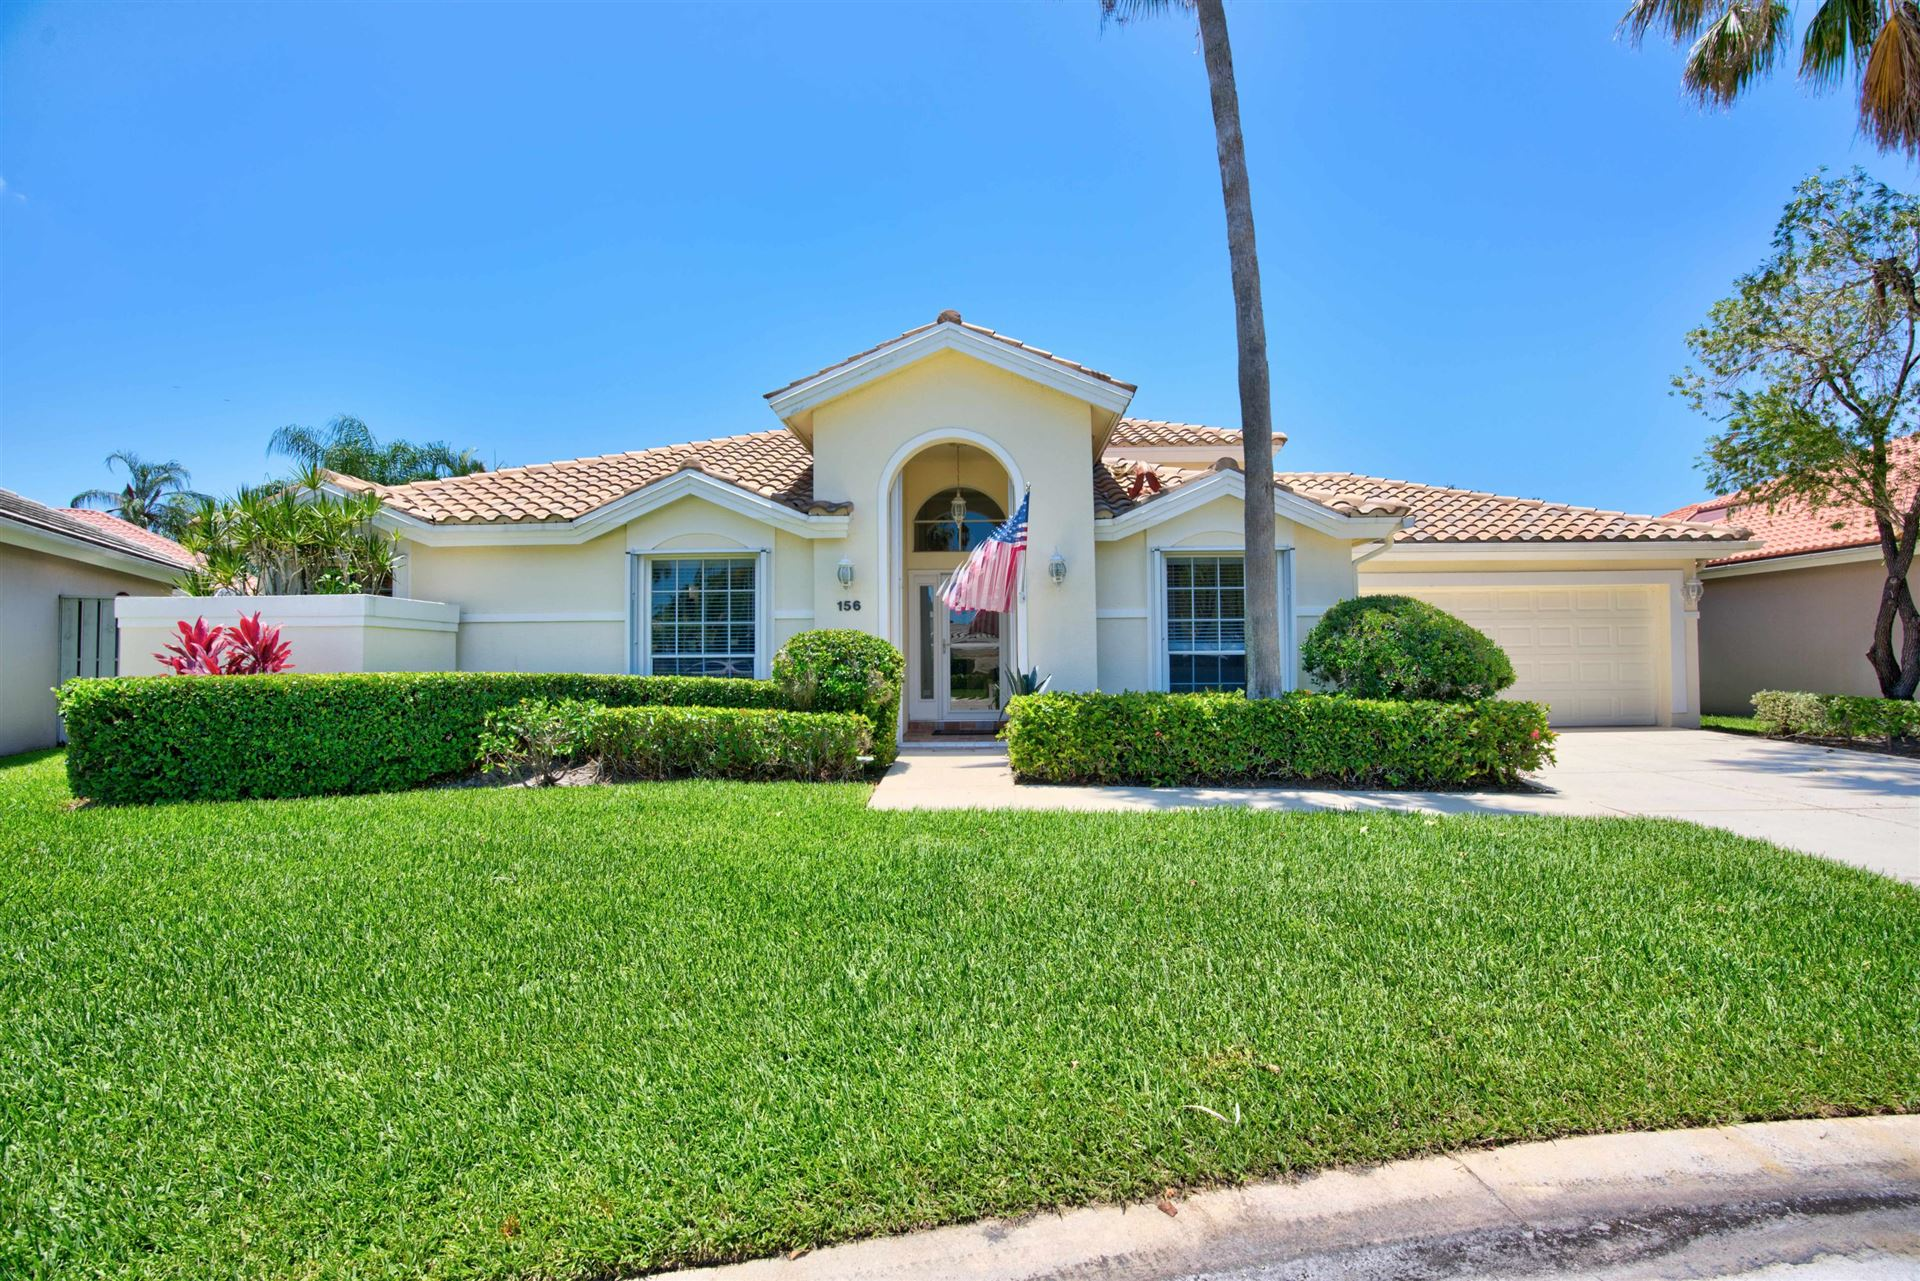 Photo of 156 Eagleton Court, Palm Beach Gardens, FL 33418 (MLS # RX-10630119)